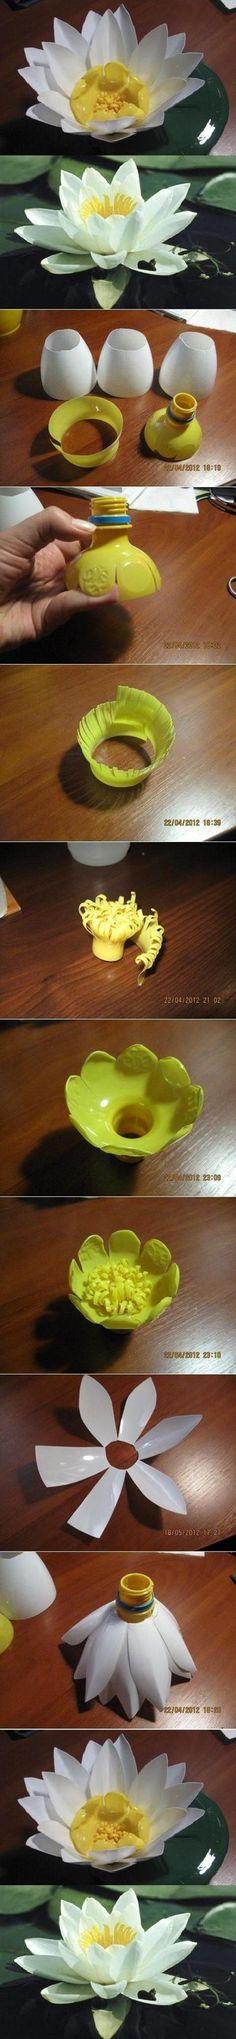 Plastic Bottle Craft Ideas for Kids28